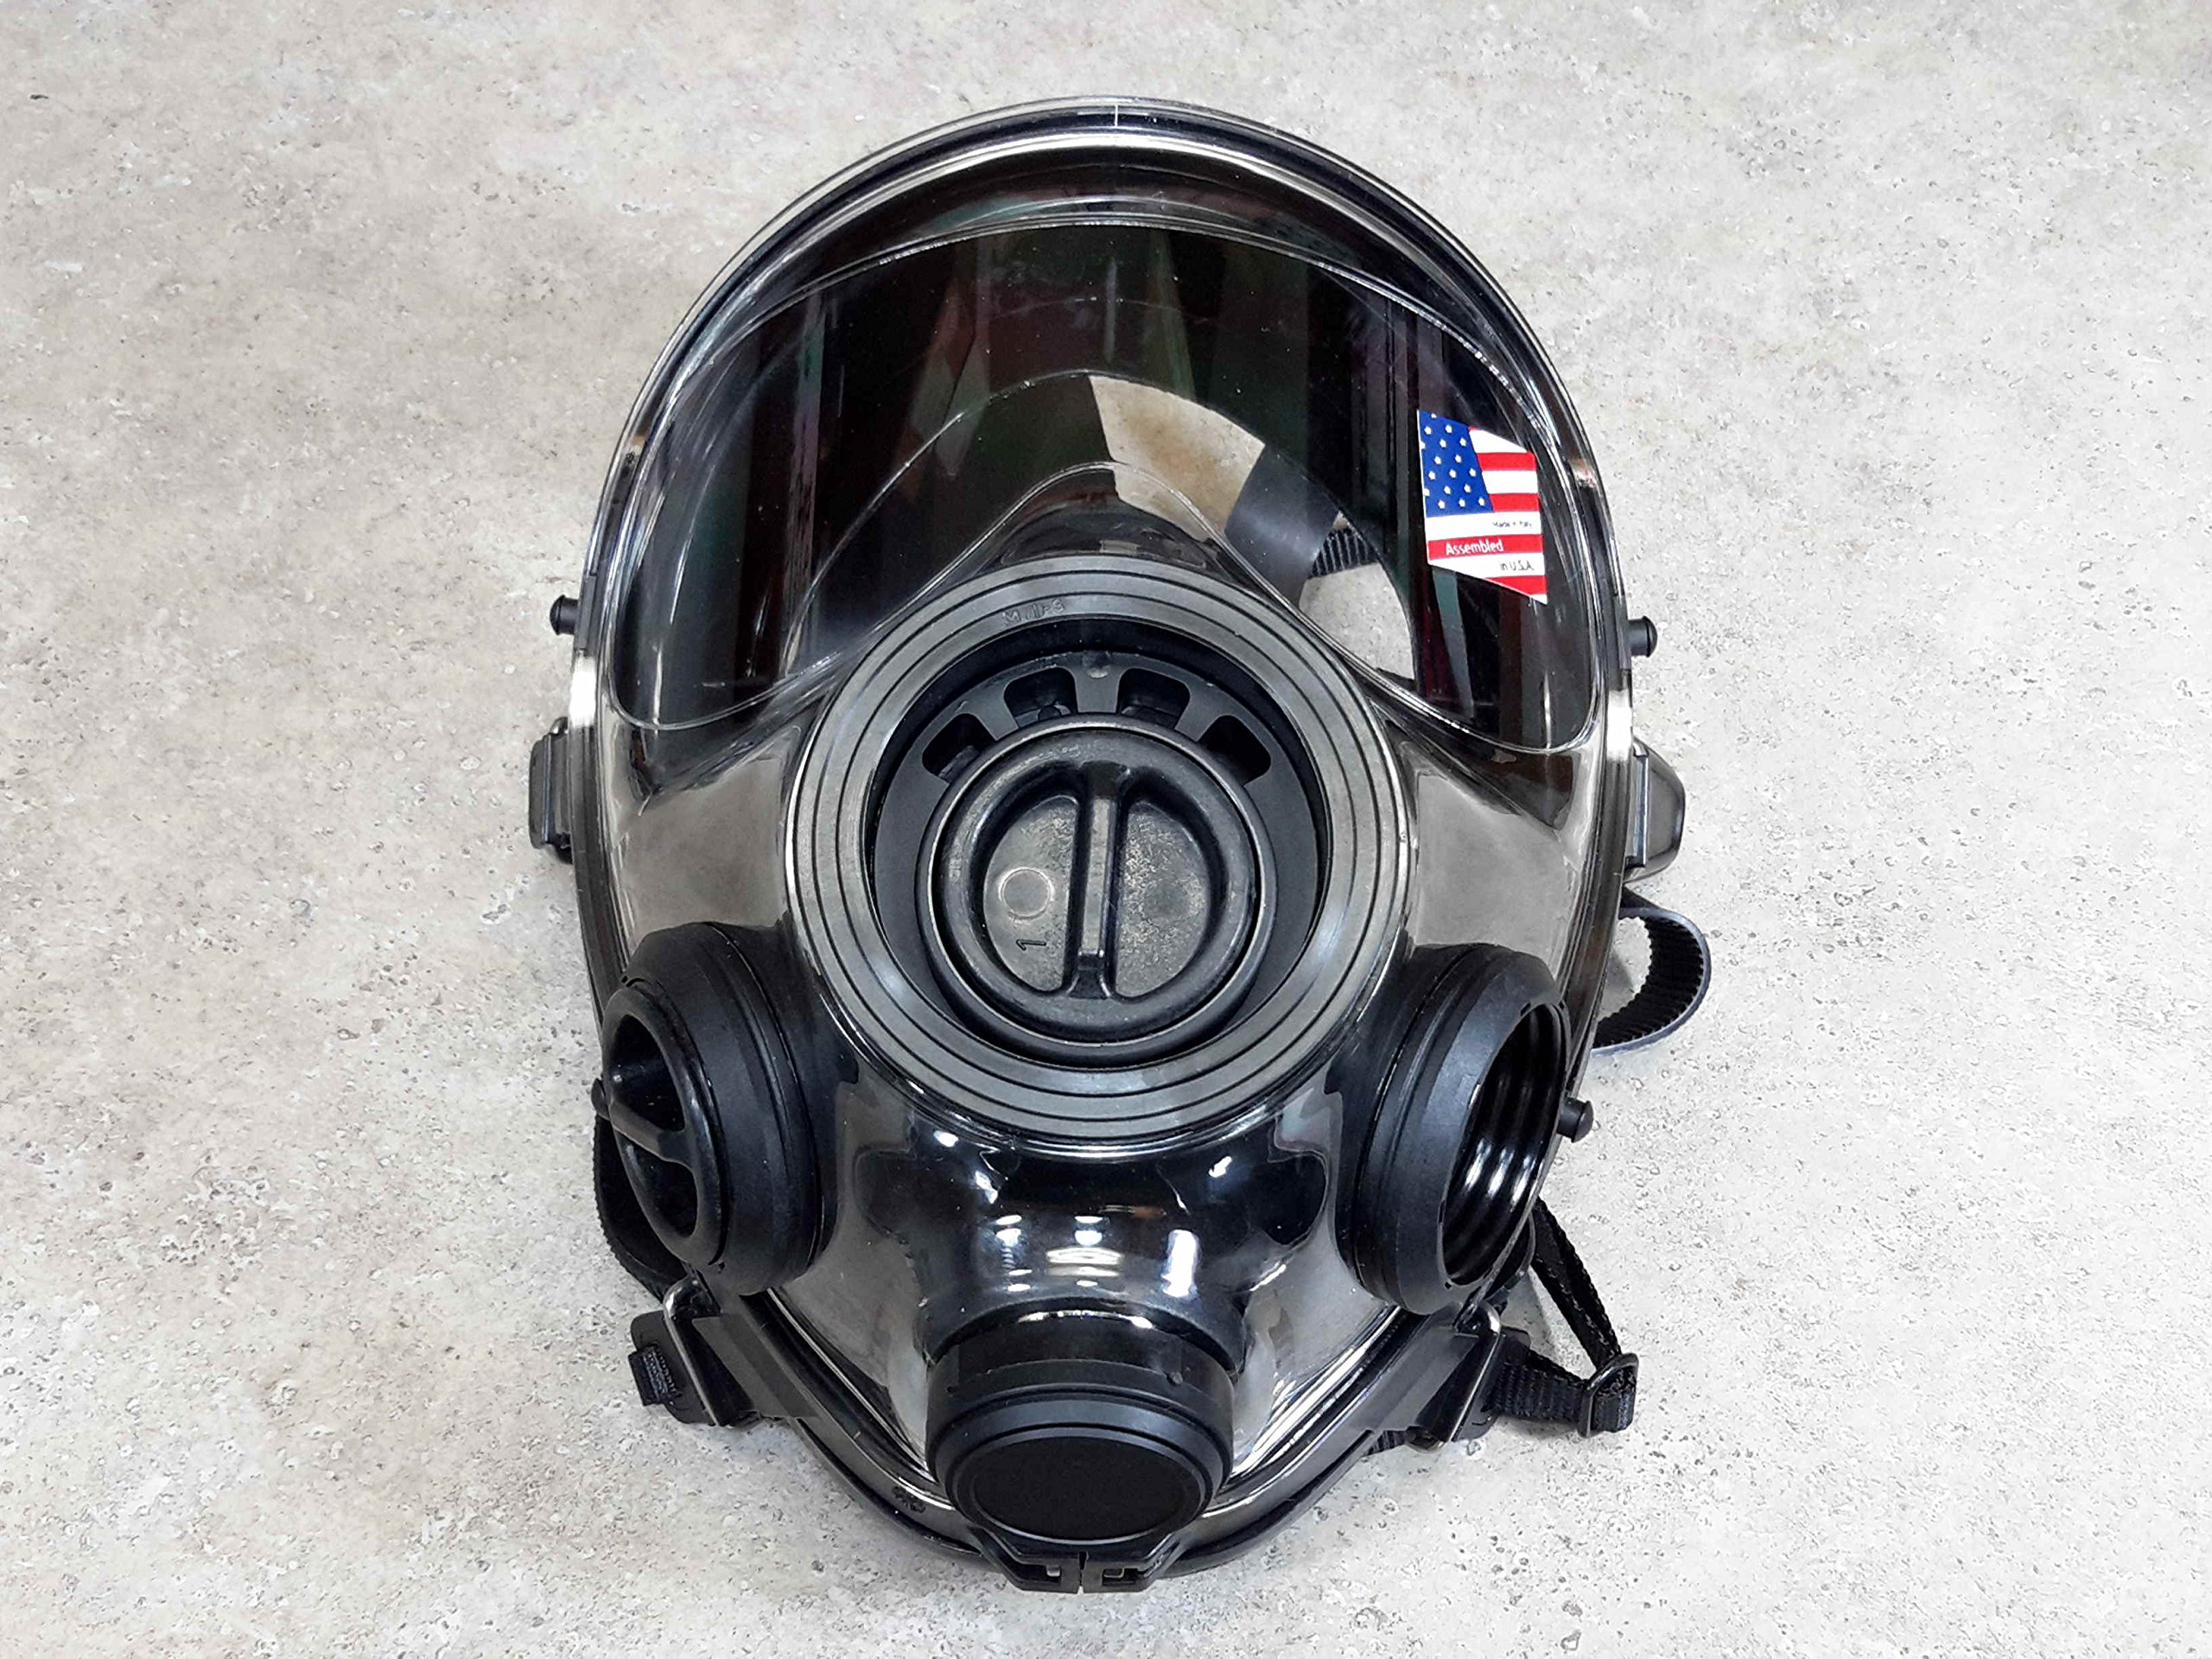 SGE 1 Gas Mask/Respirator 400/3, Medium/Large by SGE (Image #2)